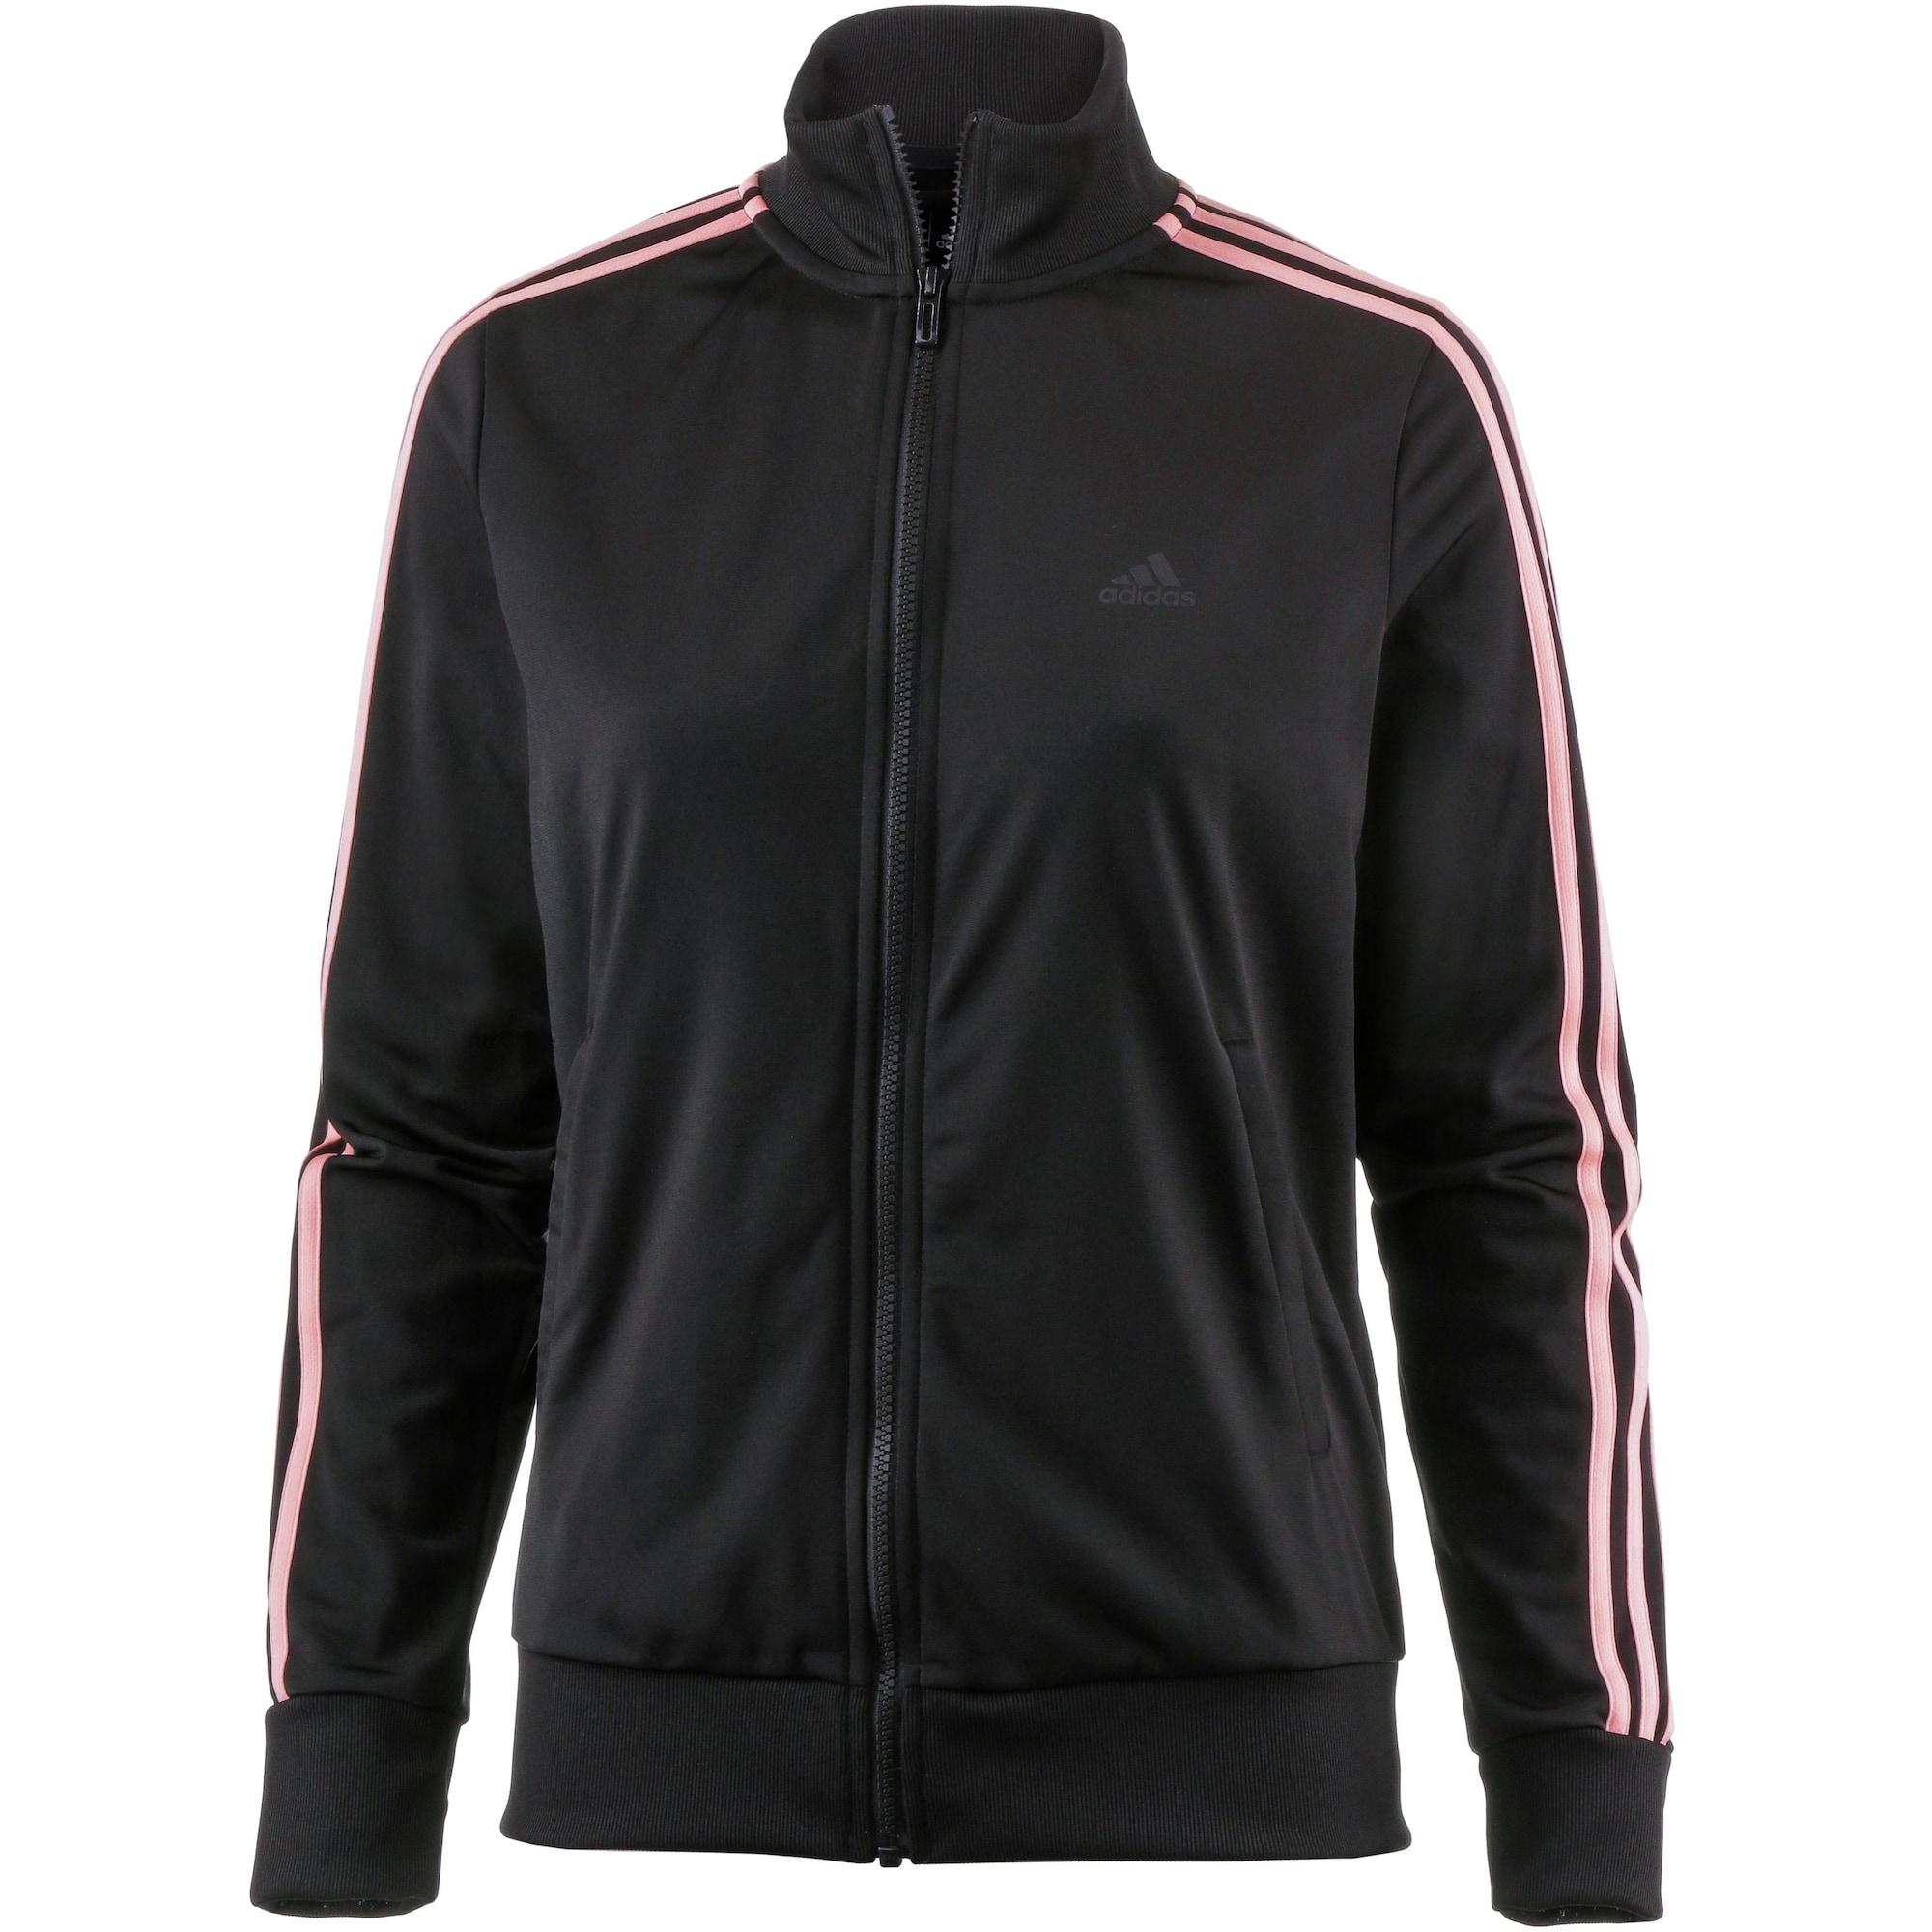 Trainingsjacke | Sportbekleidung > Sportjacken > Trainingsjacken | ADIDAS PERFORMANCE